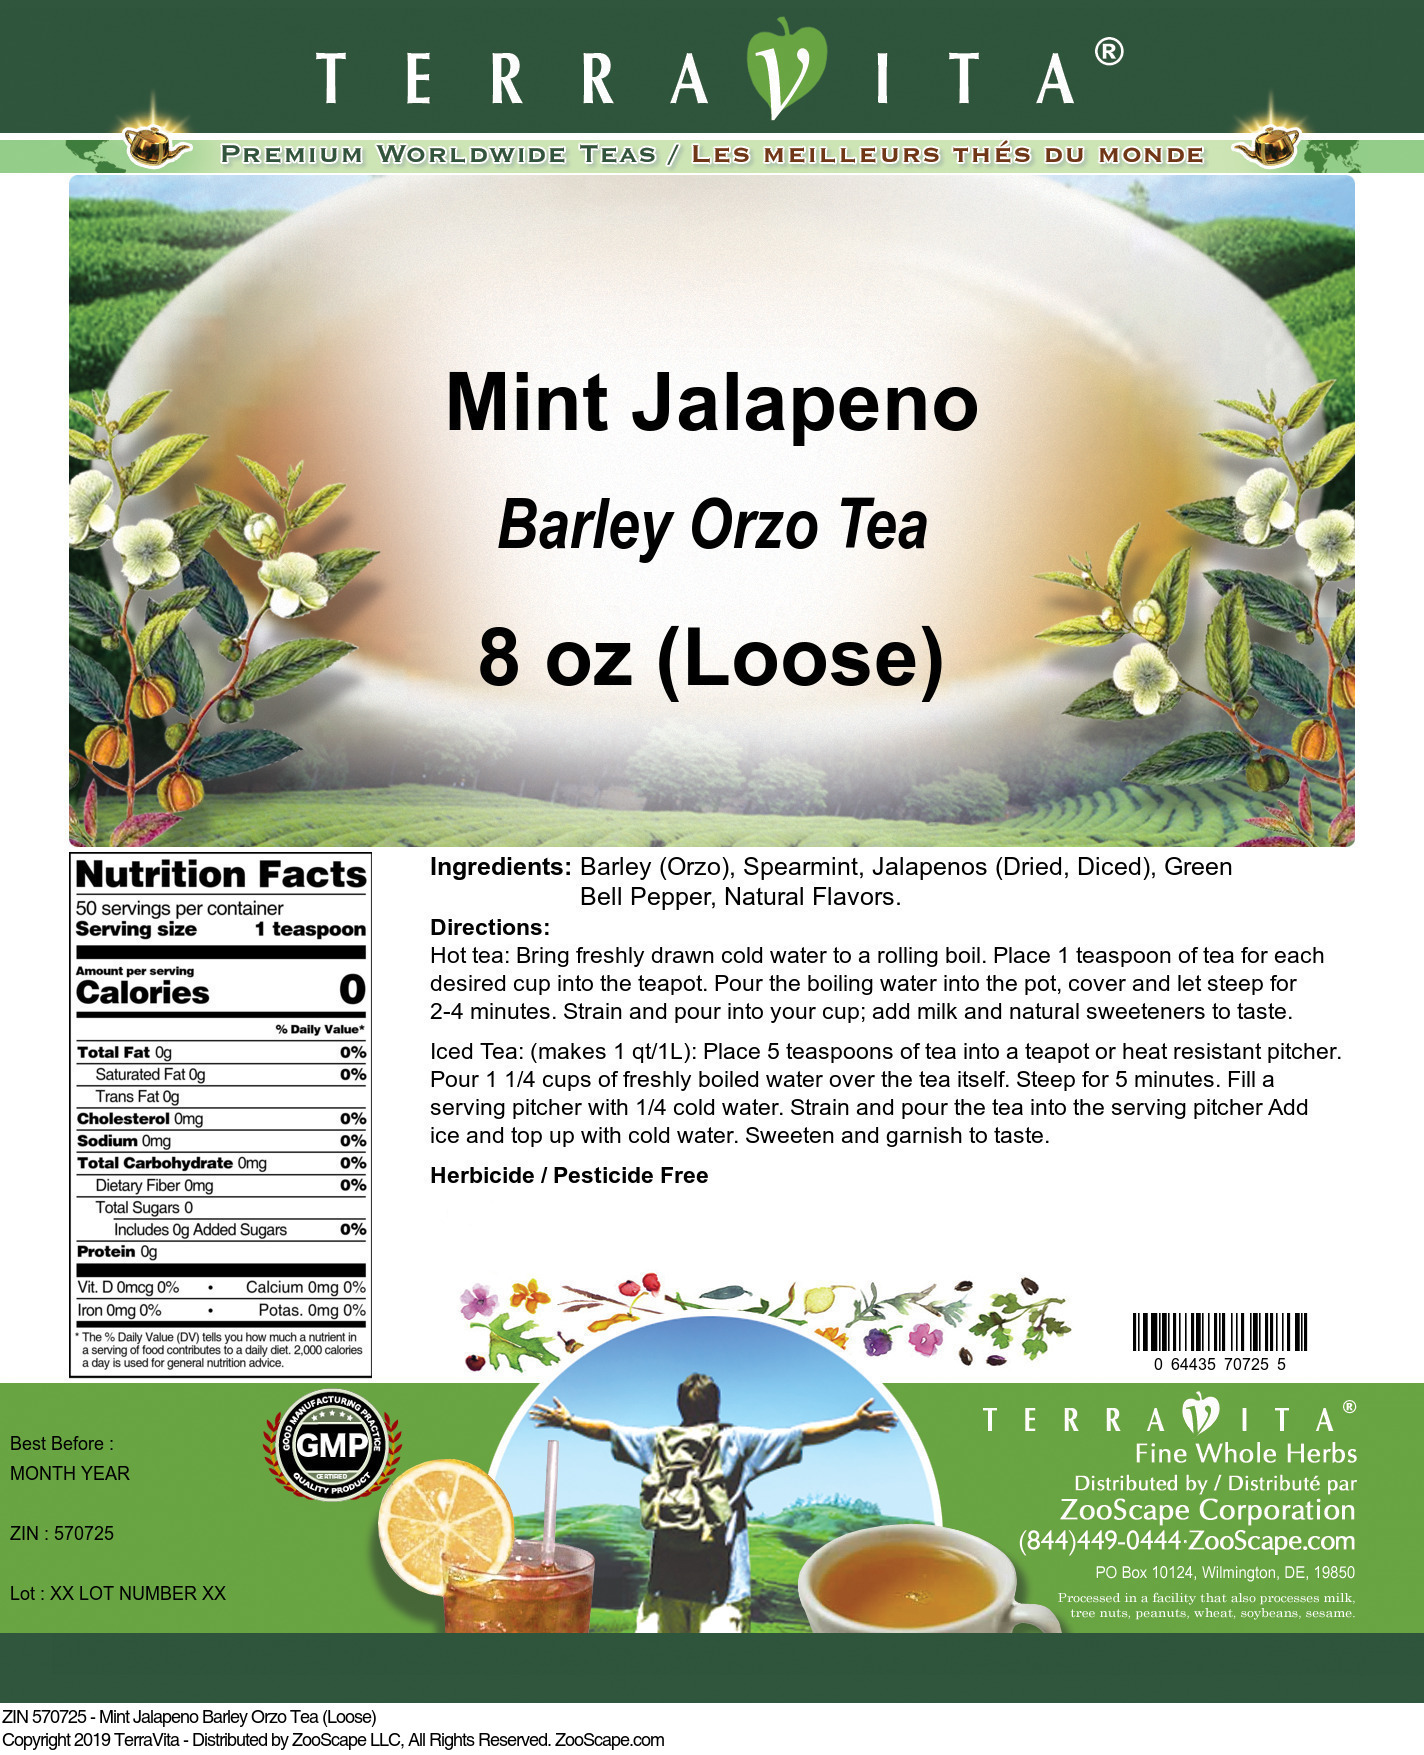 Mint Jalapeno Barley Orzo